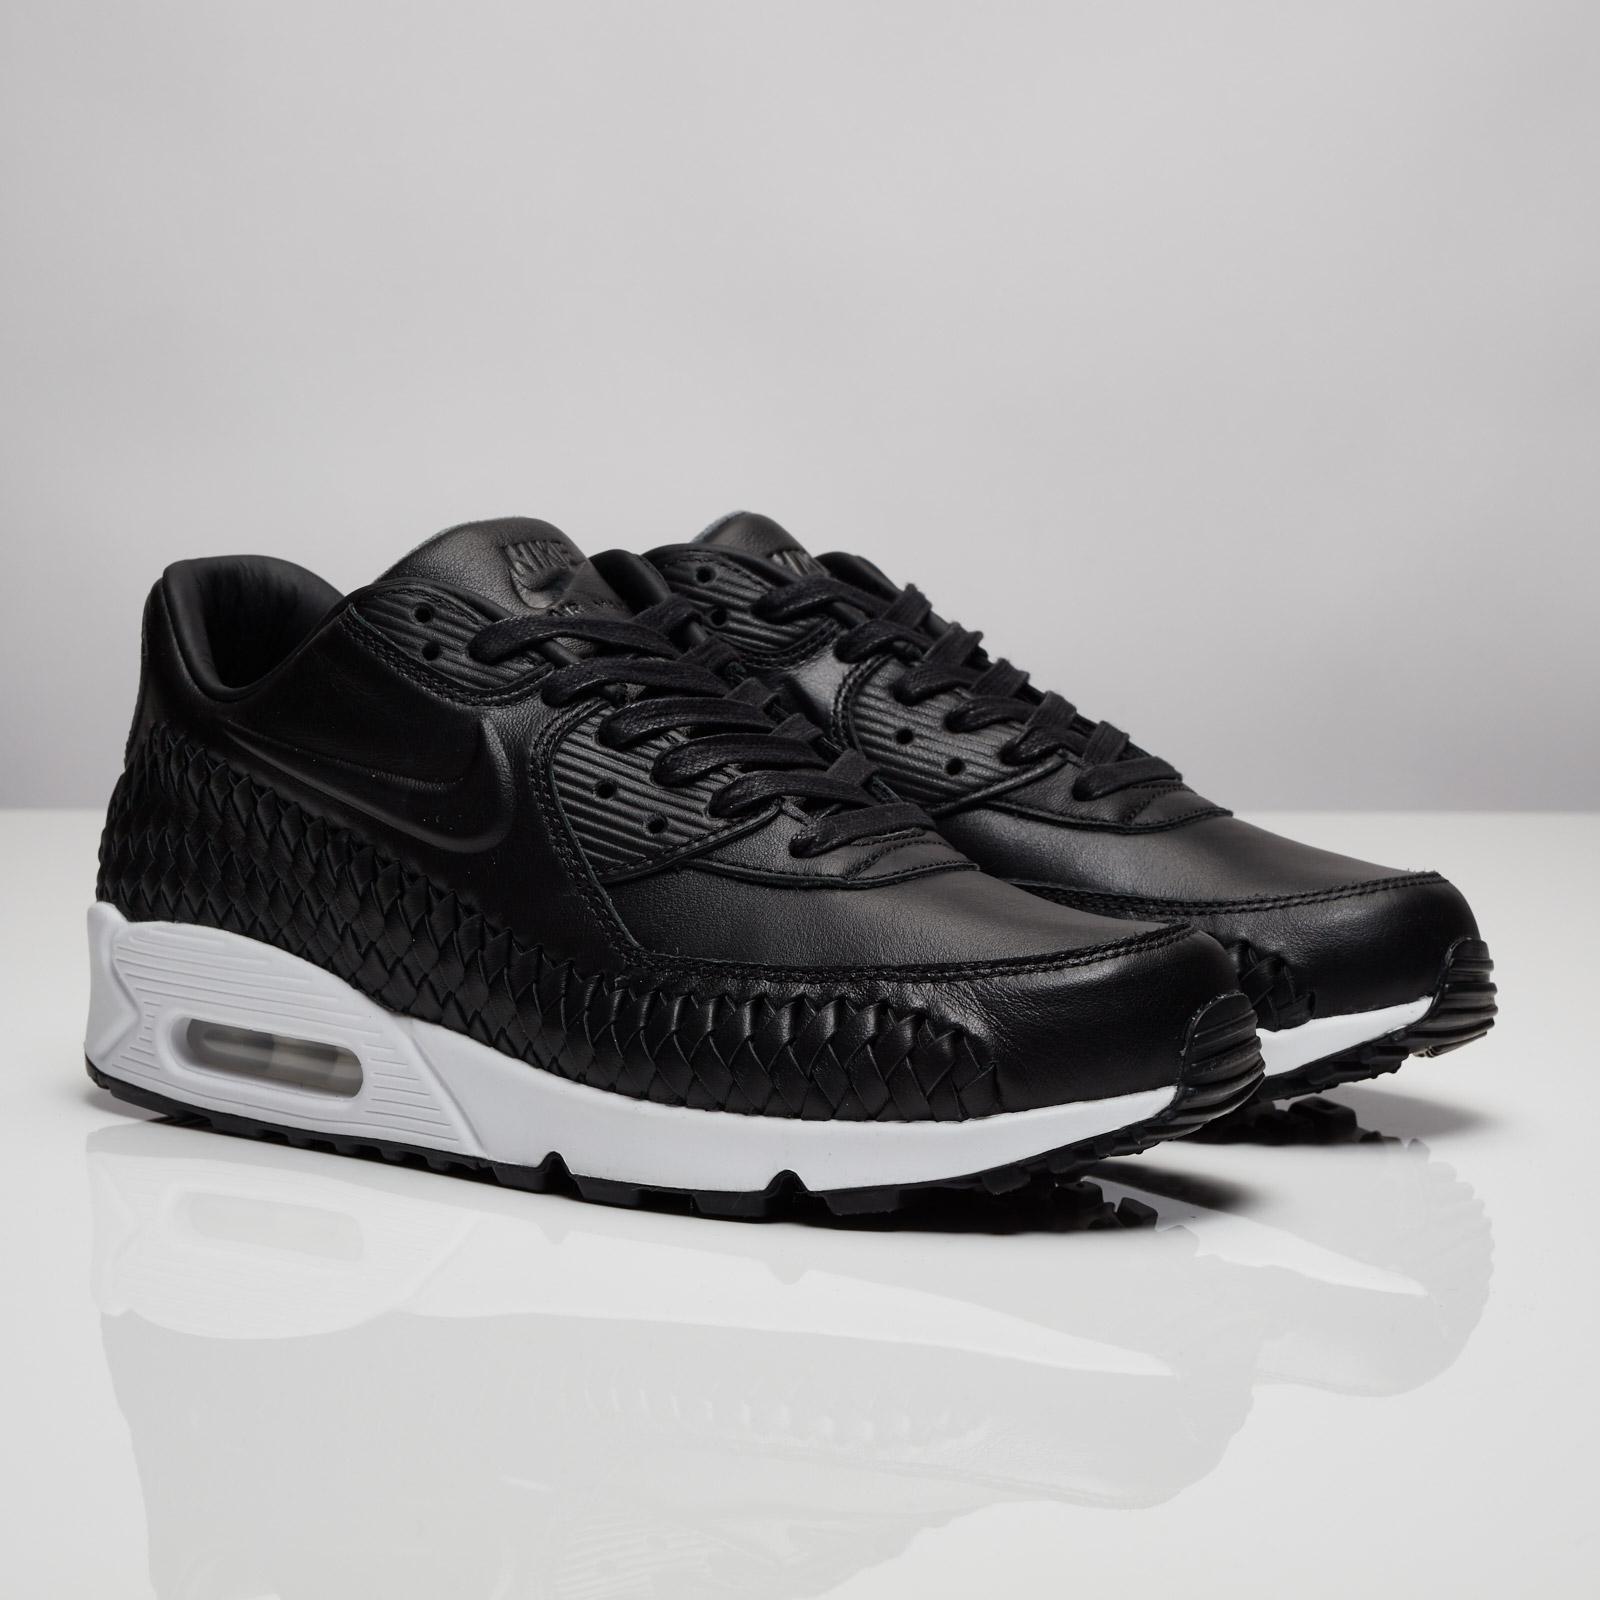 d9ca43e75b715 Nike Air Max 90 Woven - 833129-001 - Sneakersnstuff